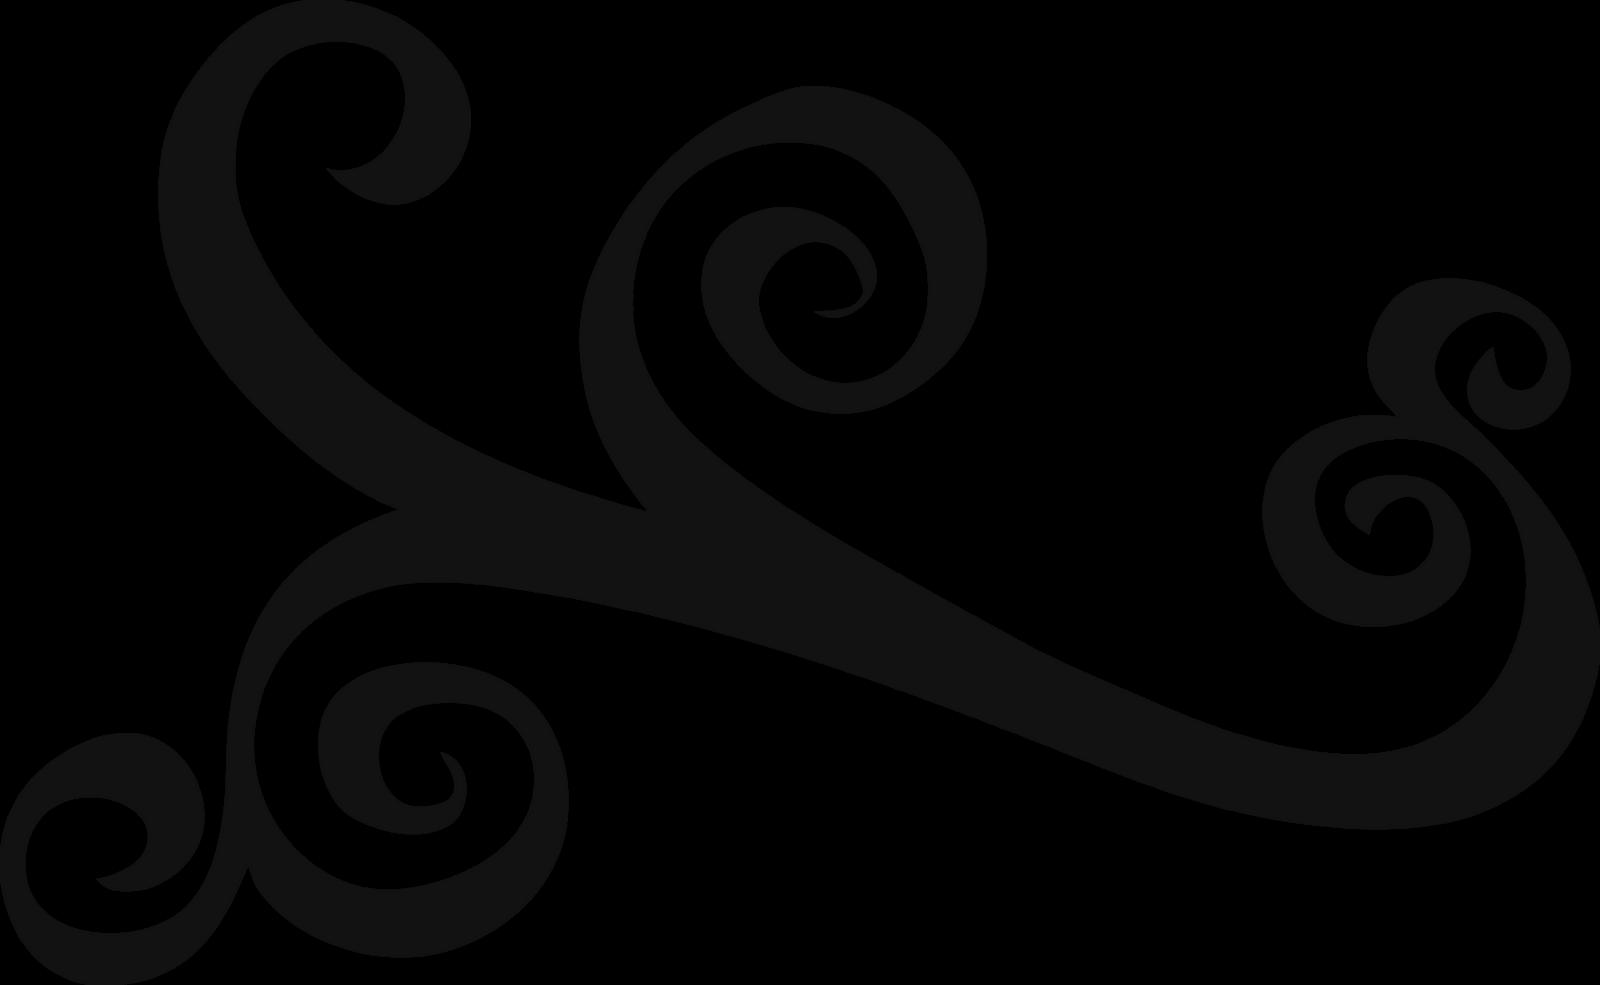 corner swirl designs clip art clipart best